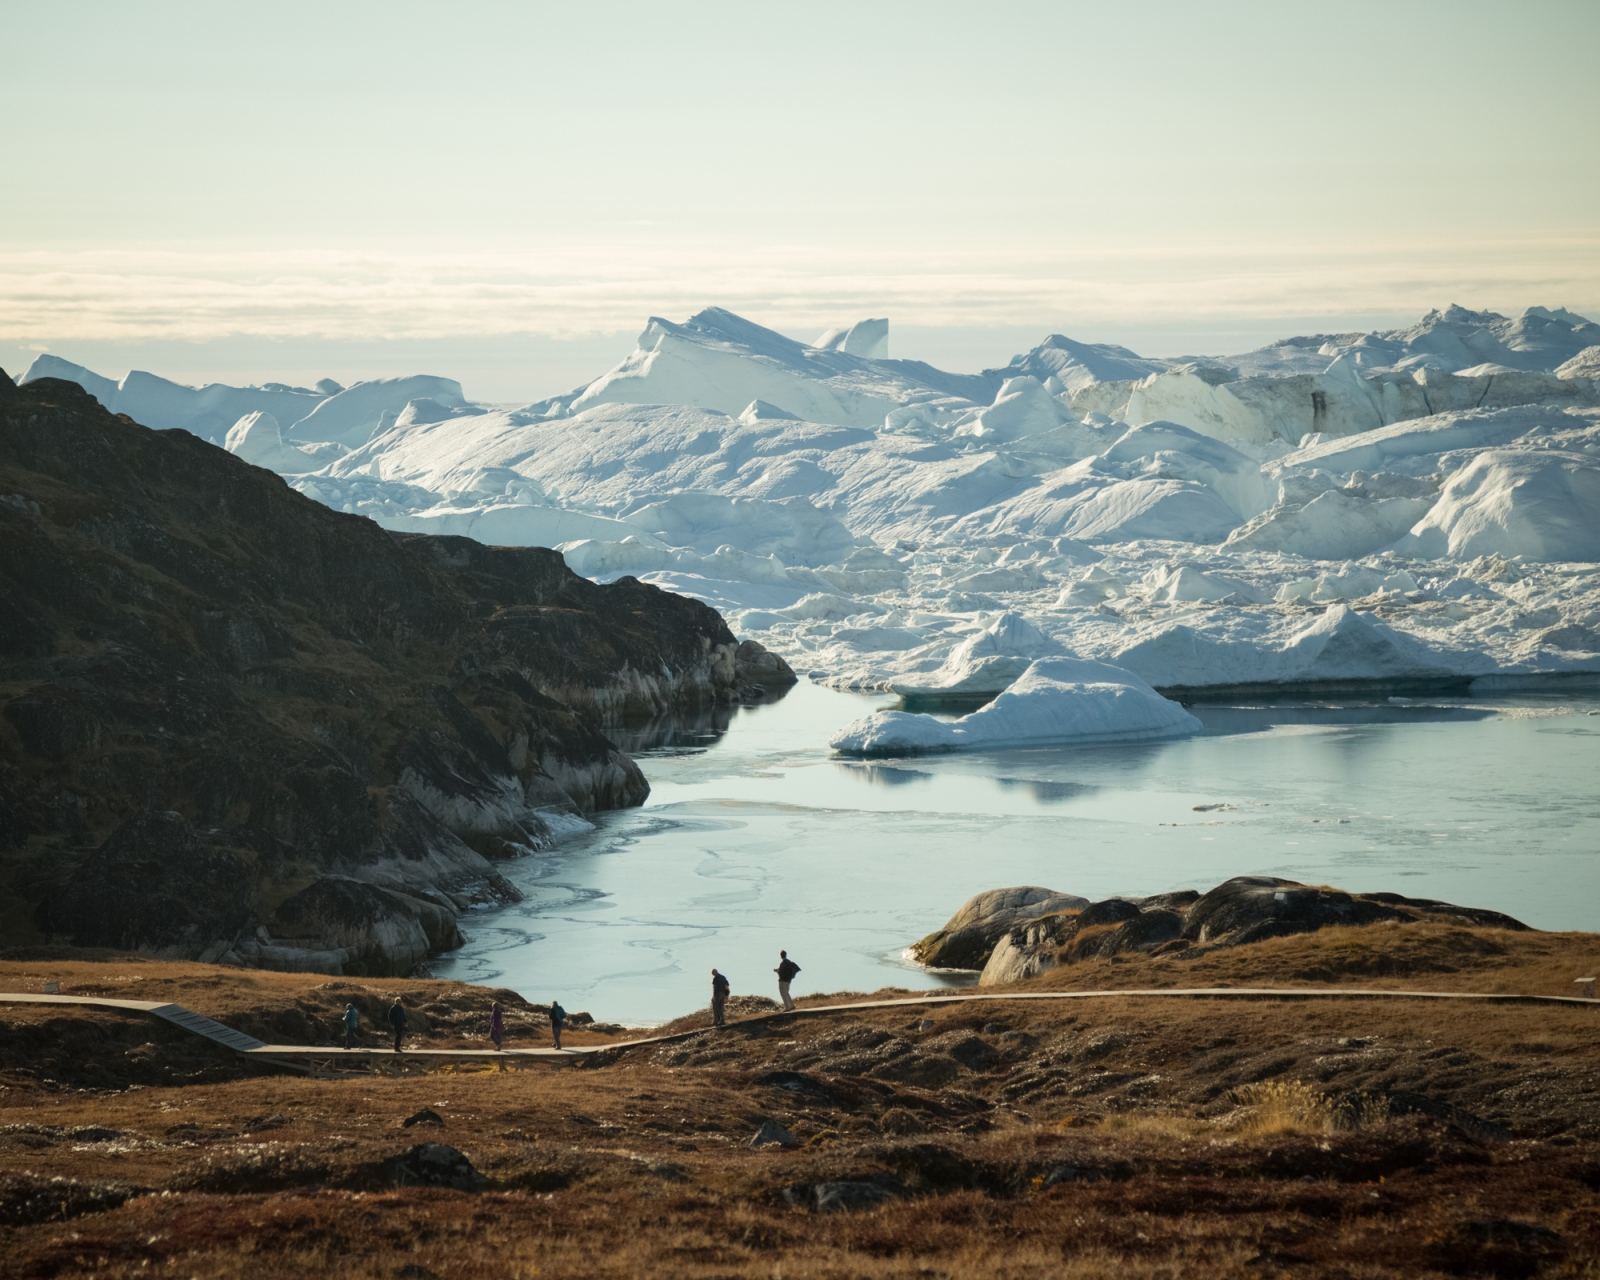 Ilulissat Icefjord, West Greenland, 2016.